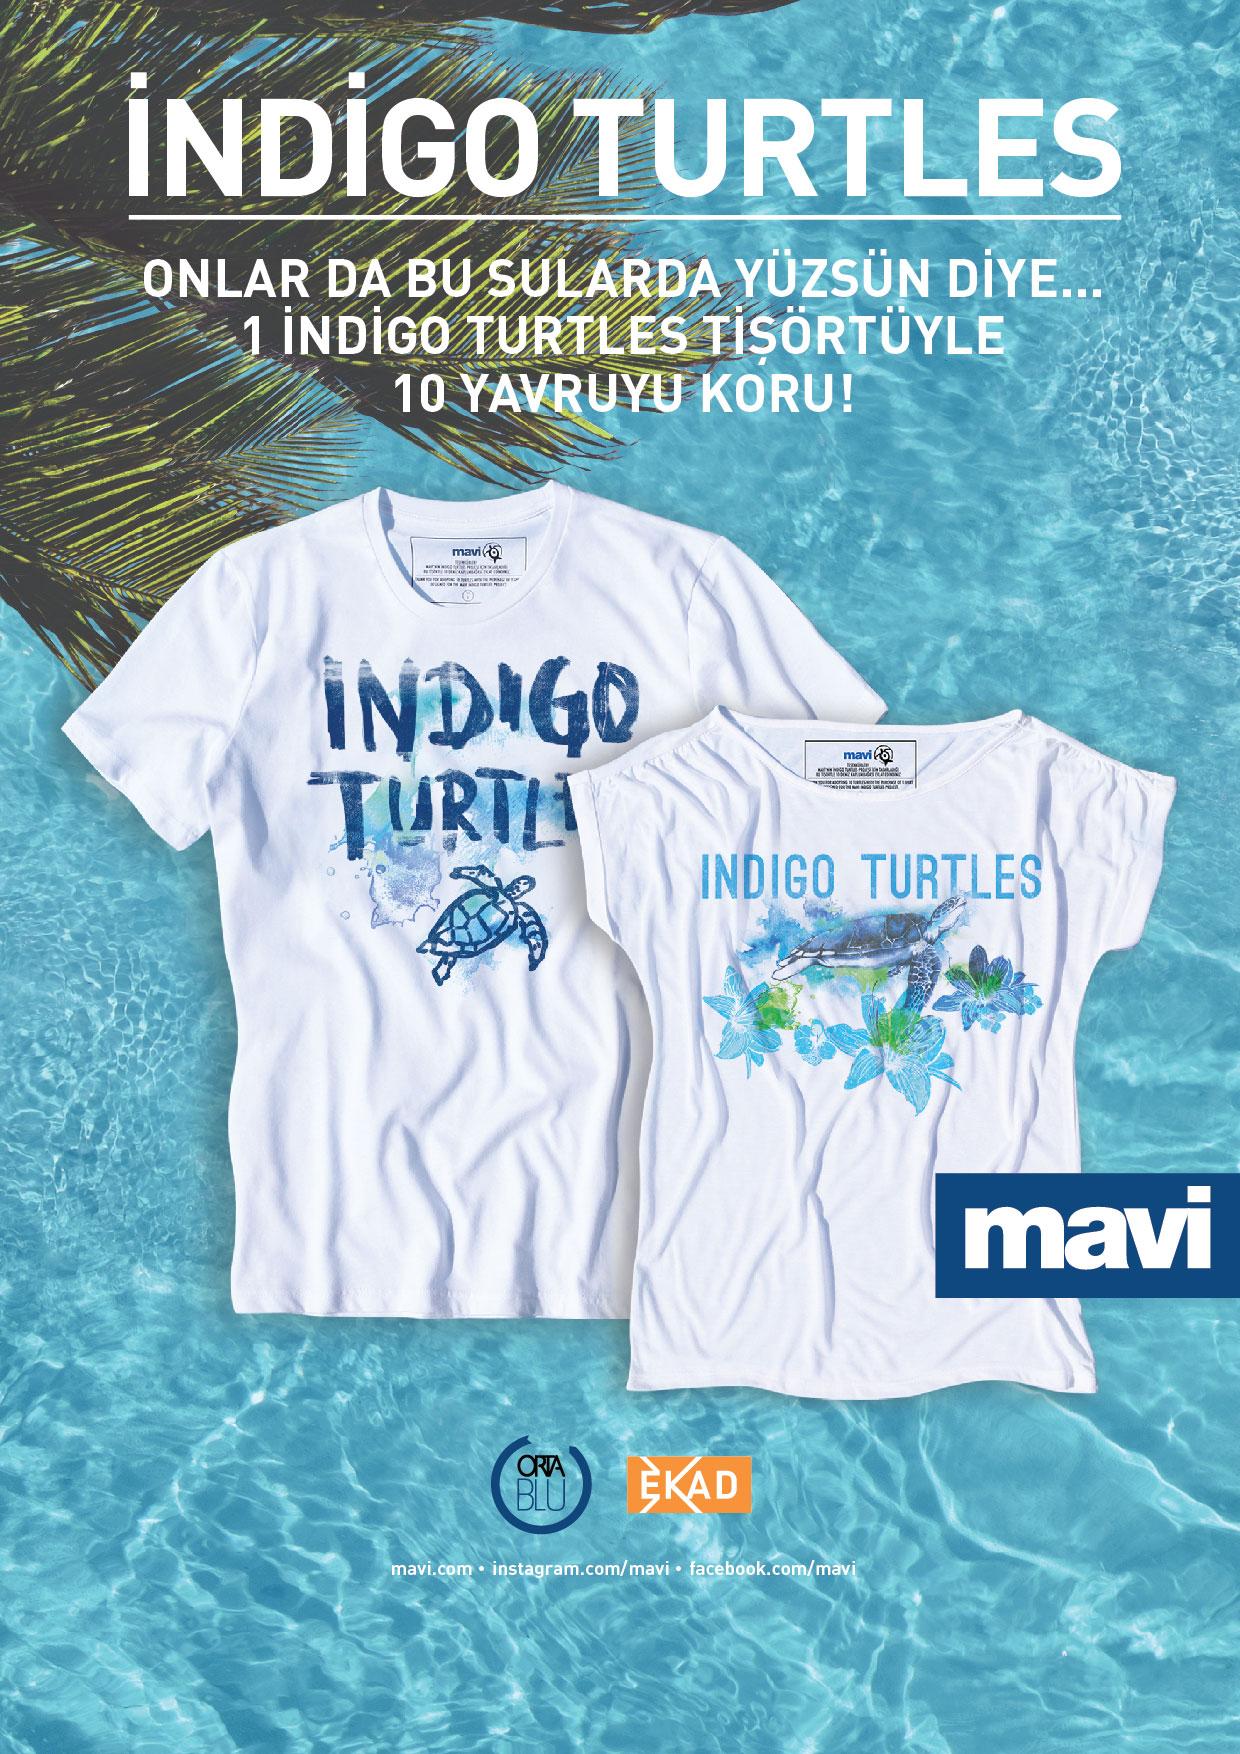 INDIGO TURTLES A4